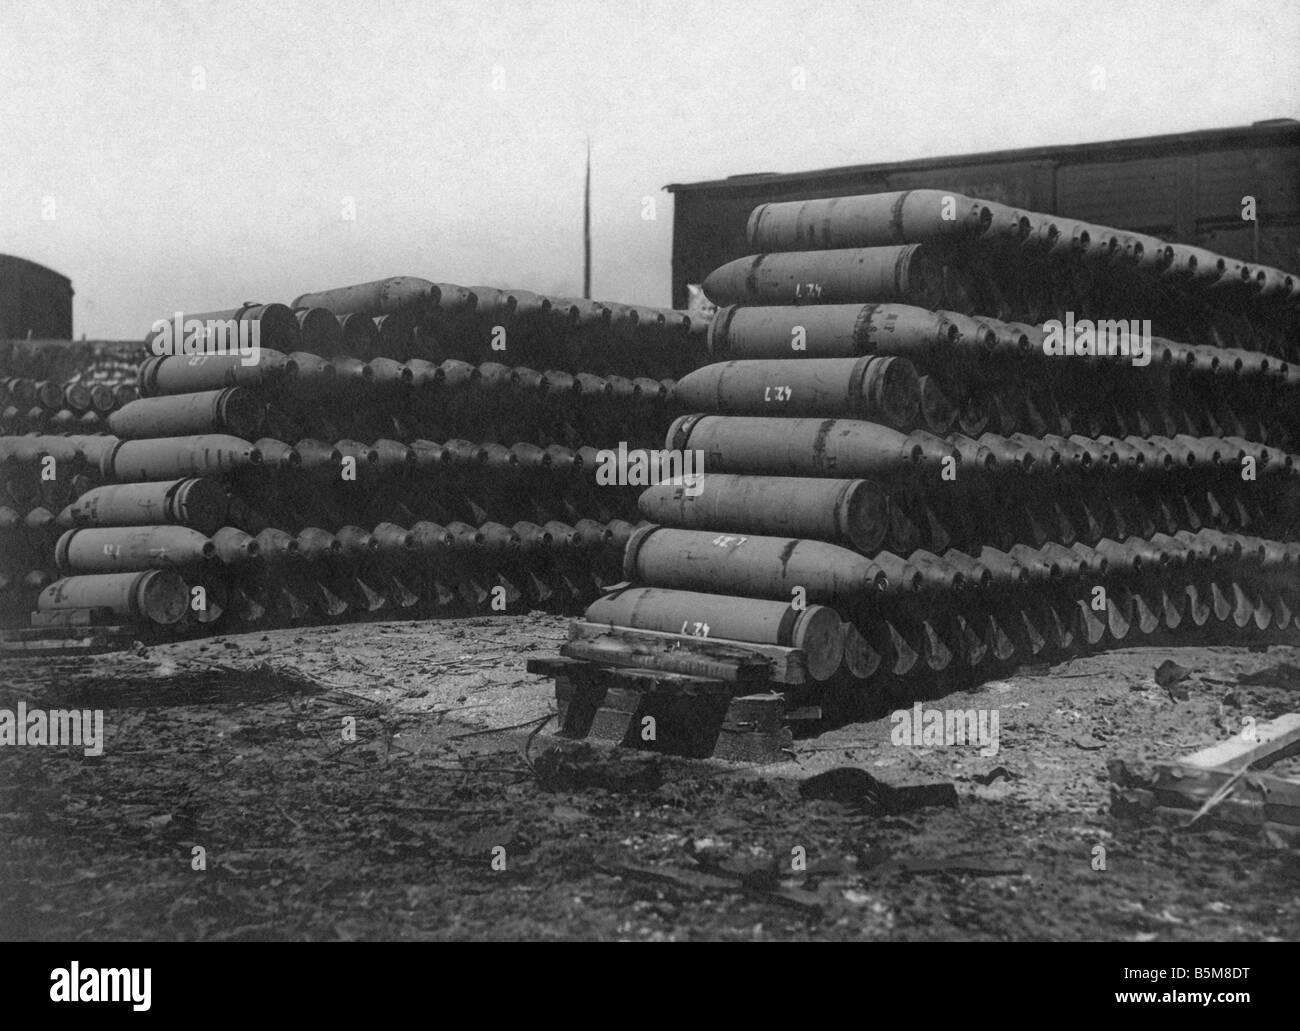 2 G55 F1 1916 60 WW1 French ammunition depot Photo History World War 1 France The Somme French ammunition depot - Stock Image